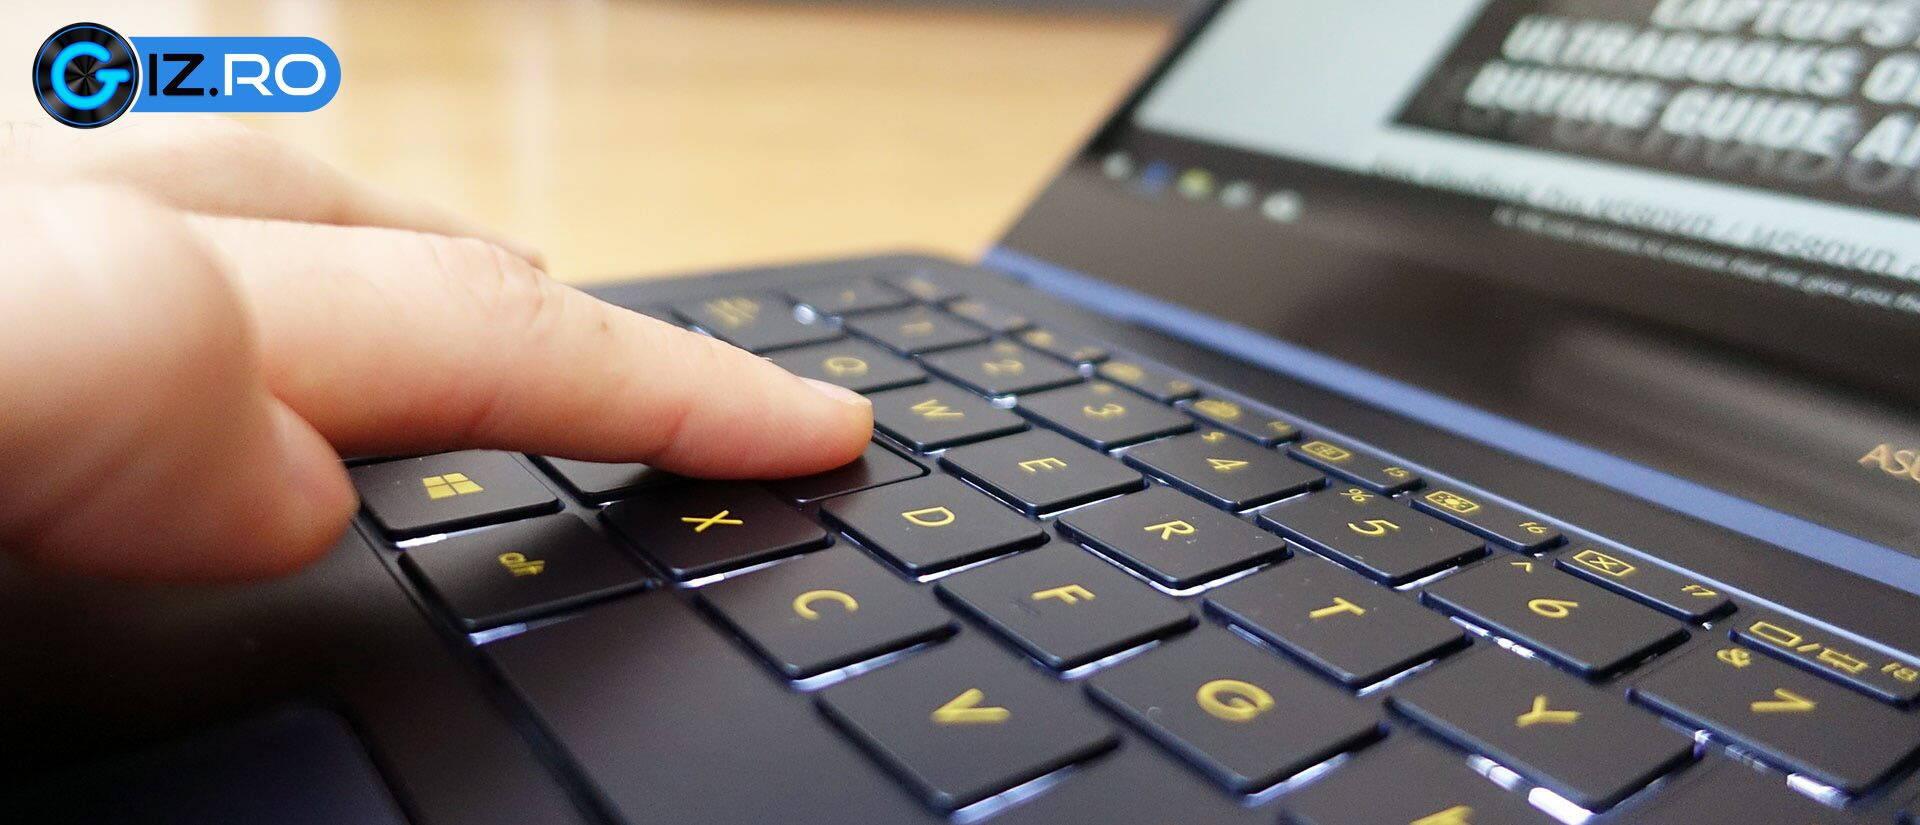 asus-zenbook-ux370ua-keyboard-stroke